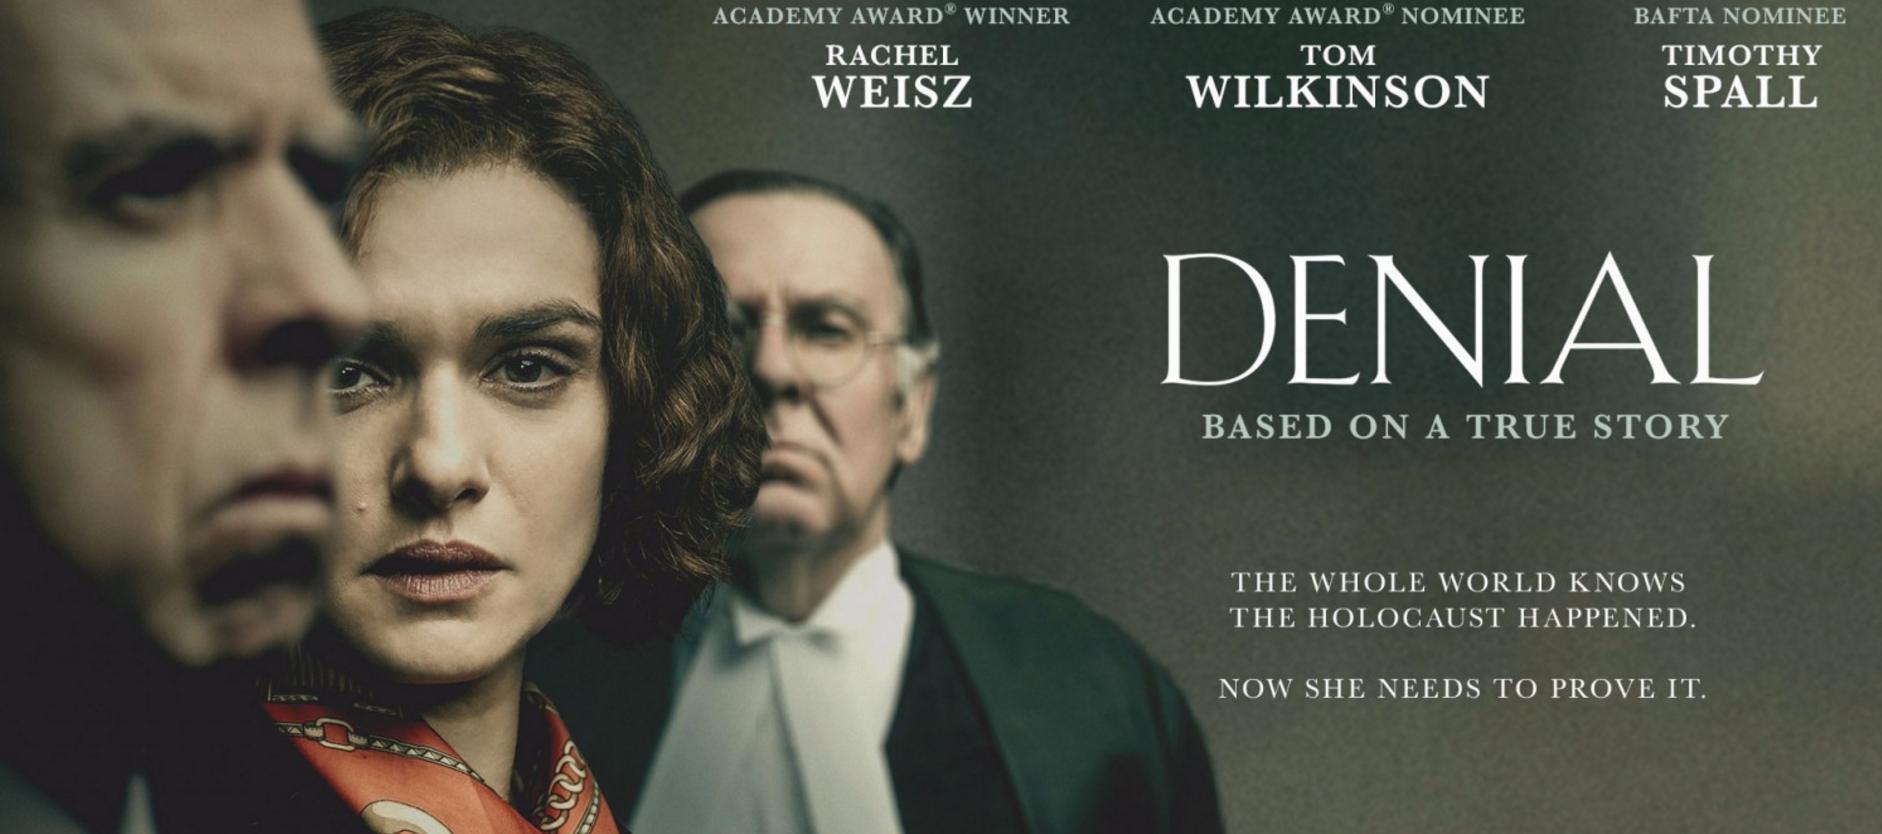 2016 Film Denial